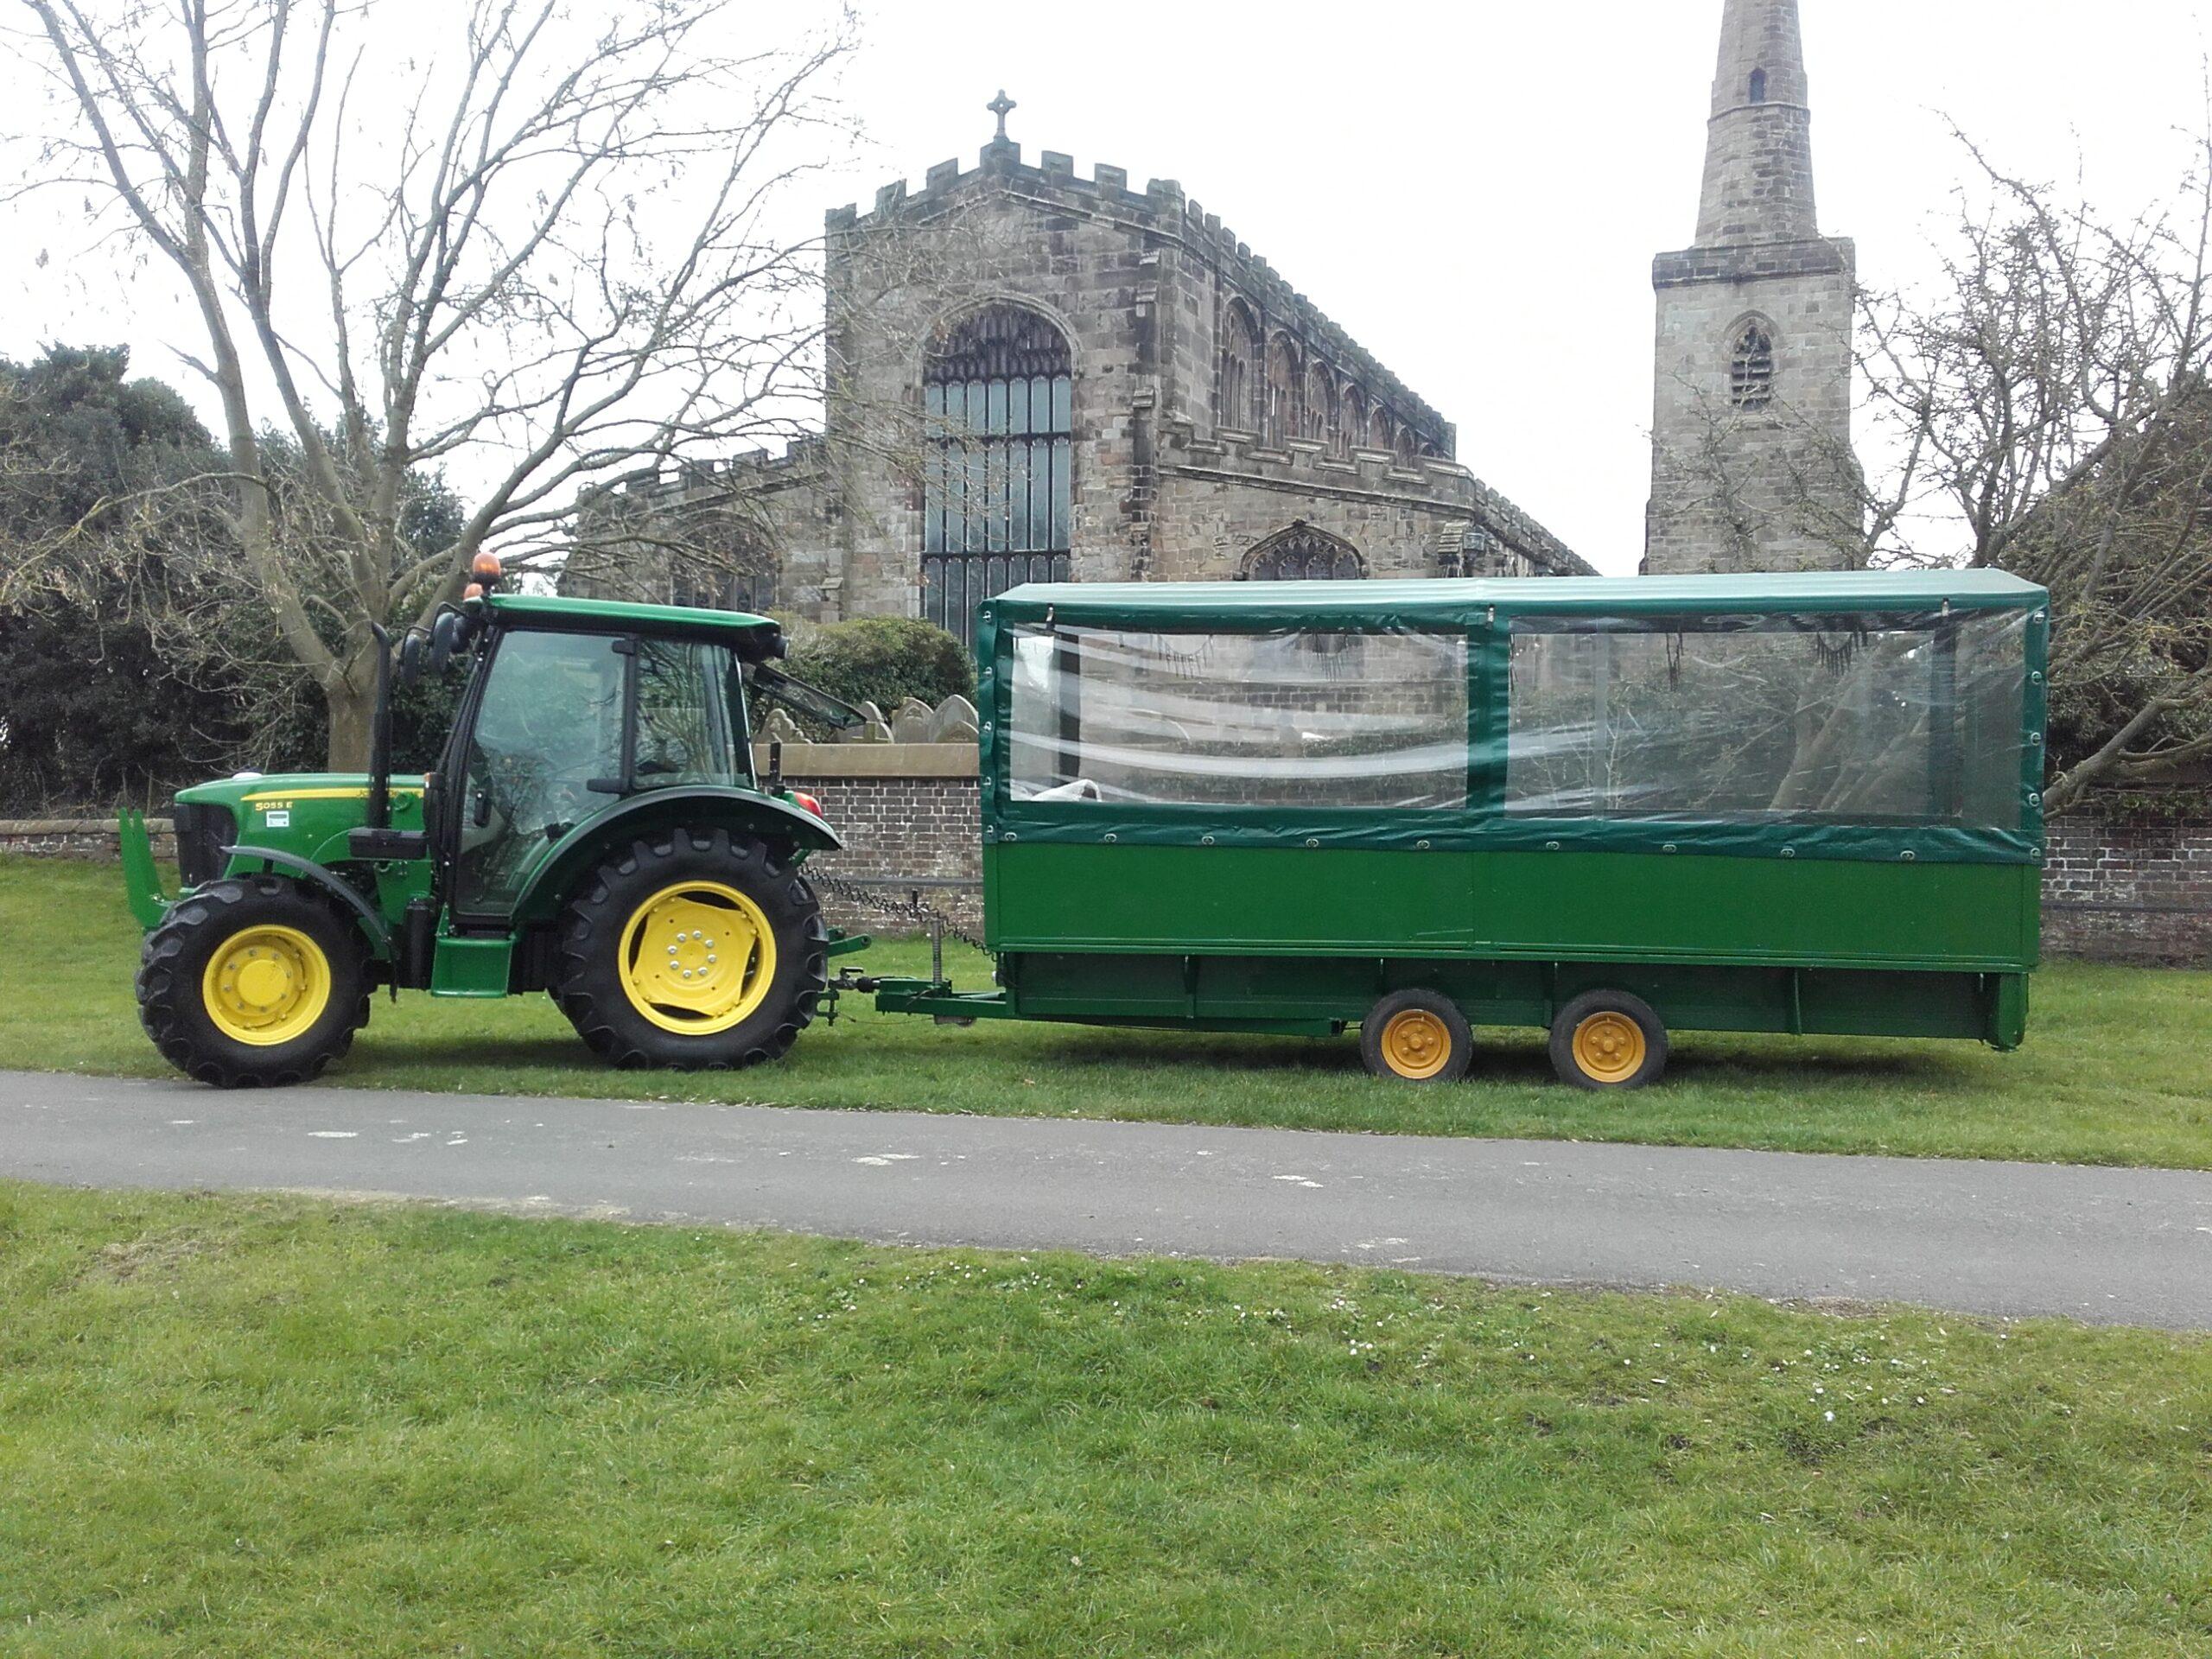 Tractor rides at Glebe Farm